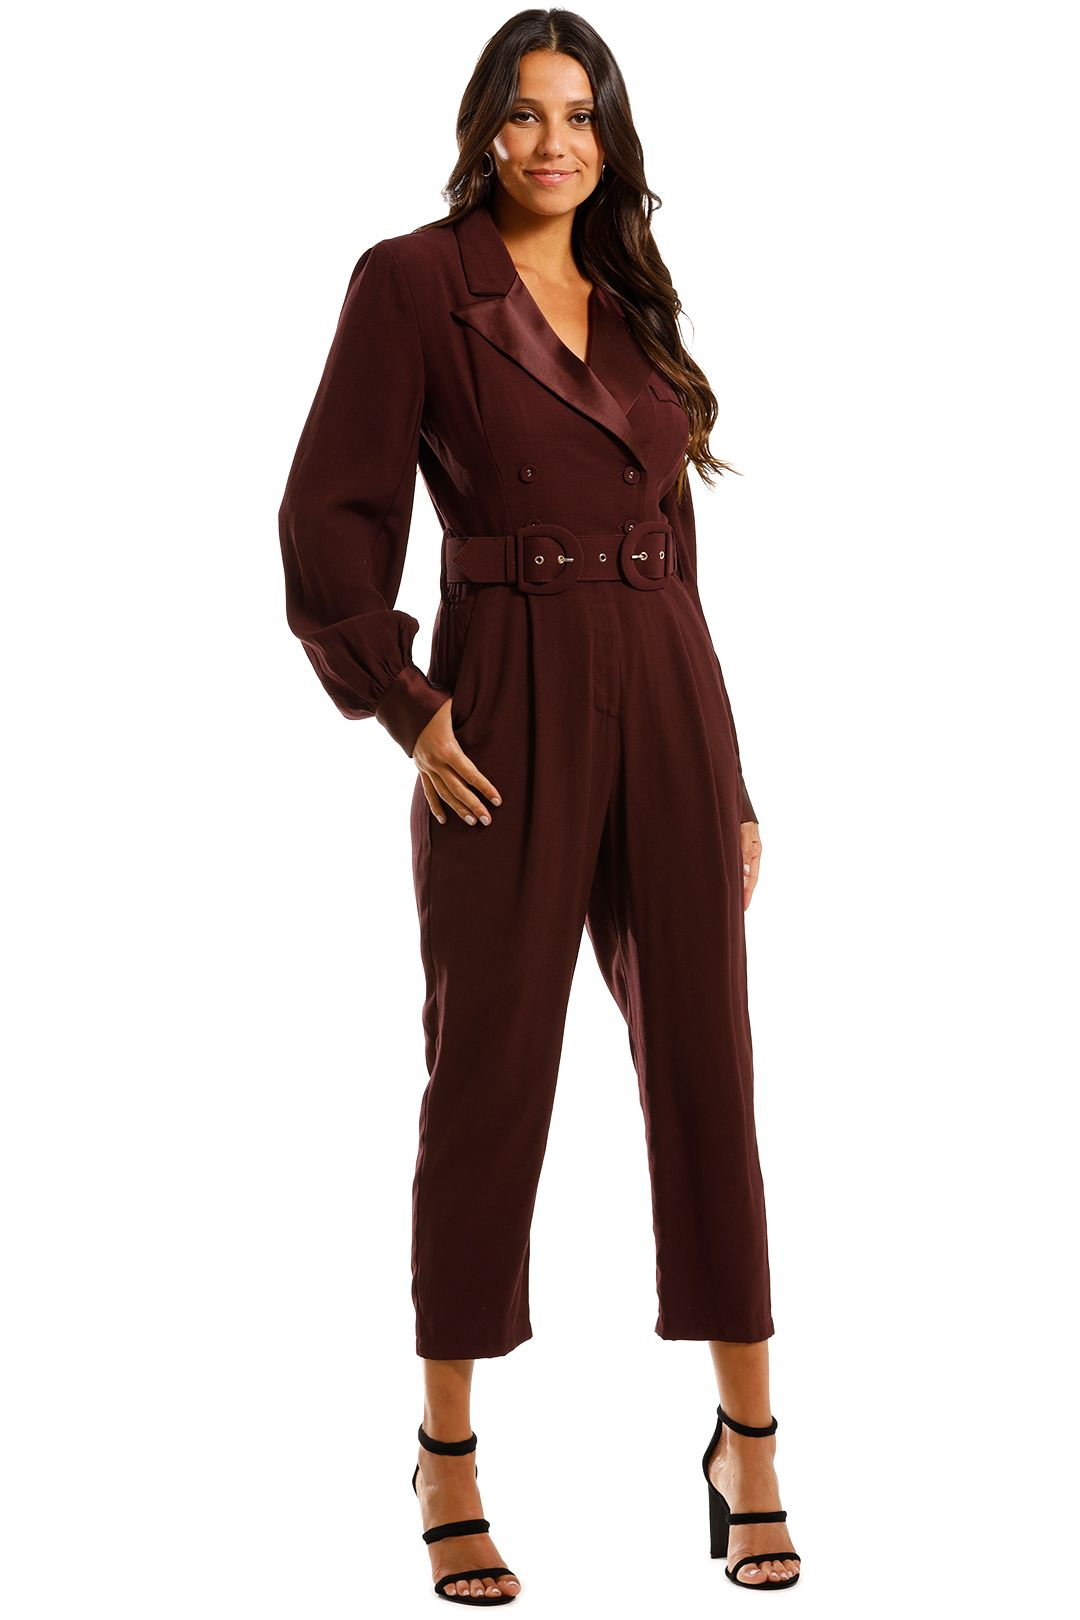 Pasduchas Austere Pantsuit Blackberry Maroon Tailored Burgundy Jumpsuit